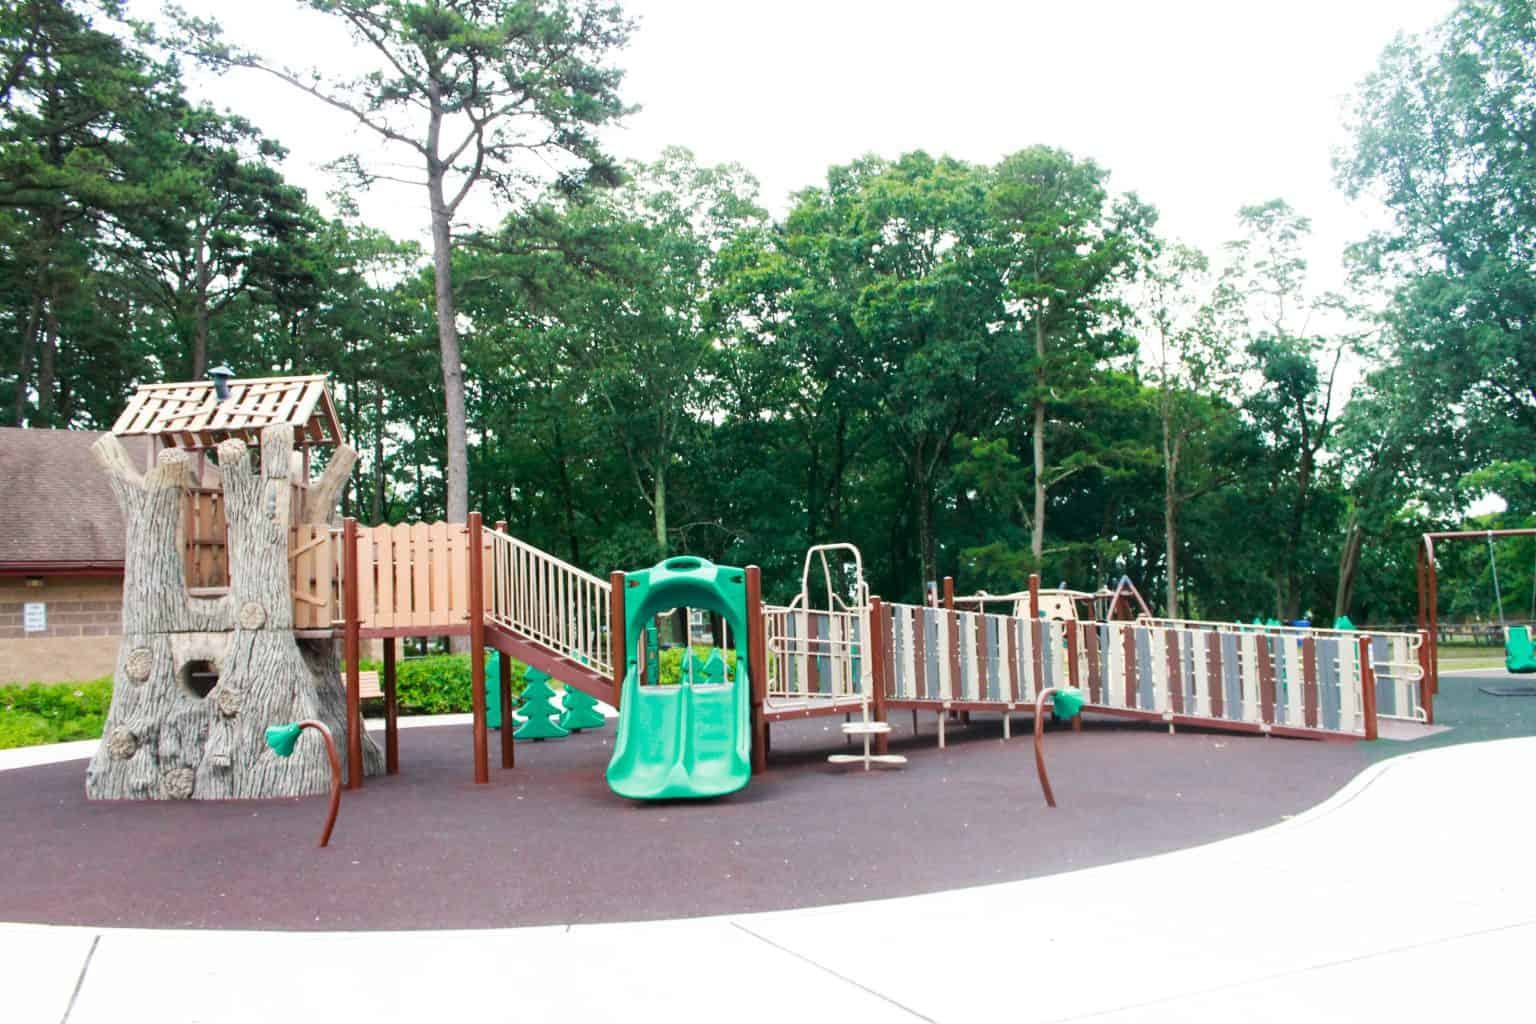 windward-beach-park-playground-brick-nj_28232624266_o-1-1536x1024